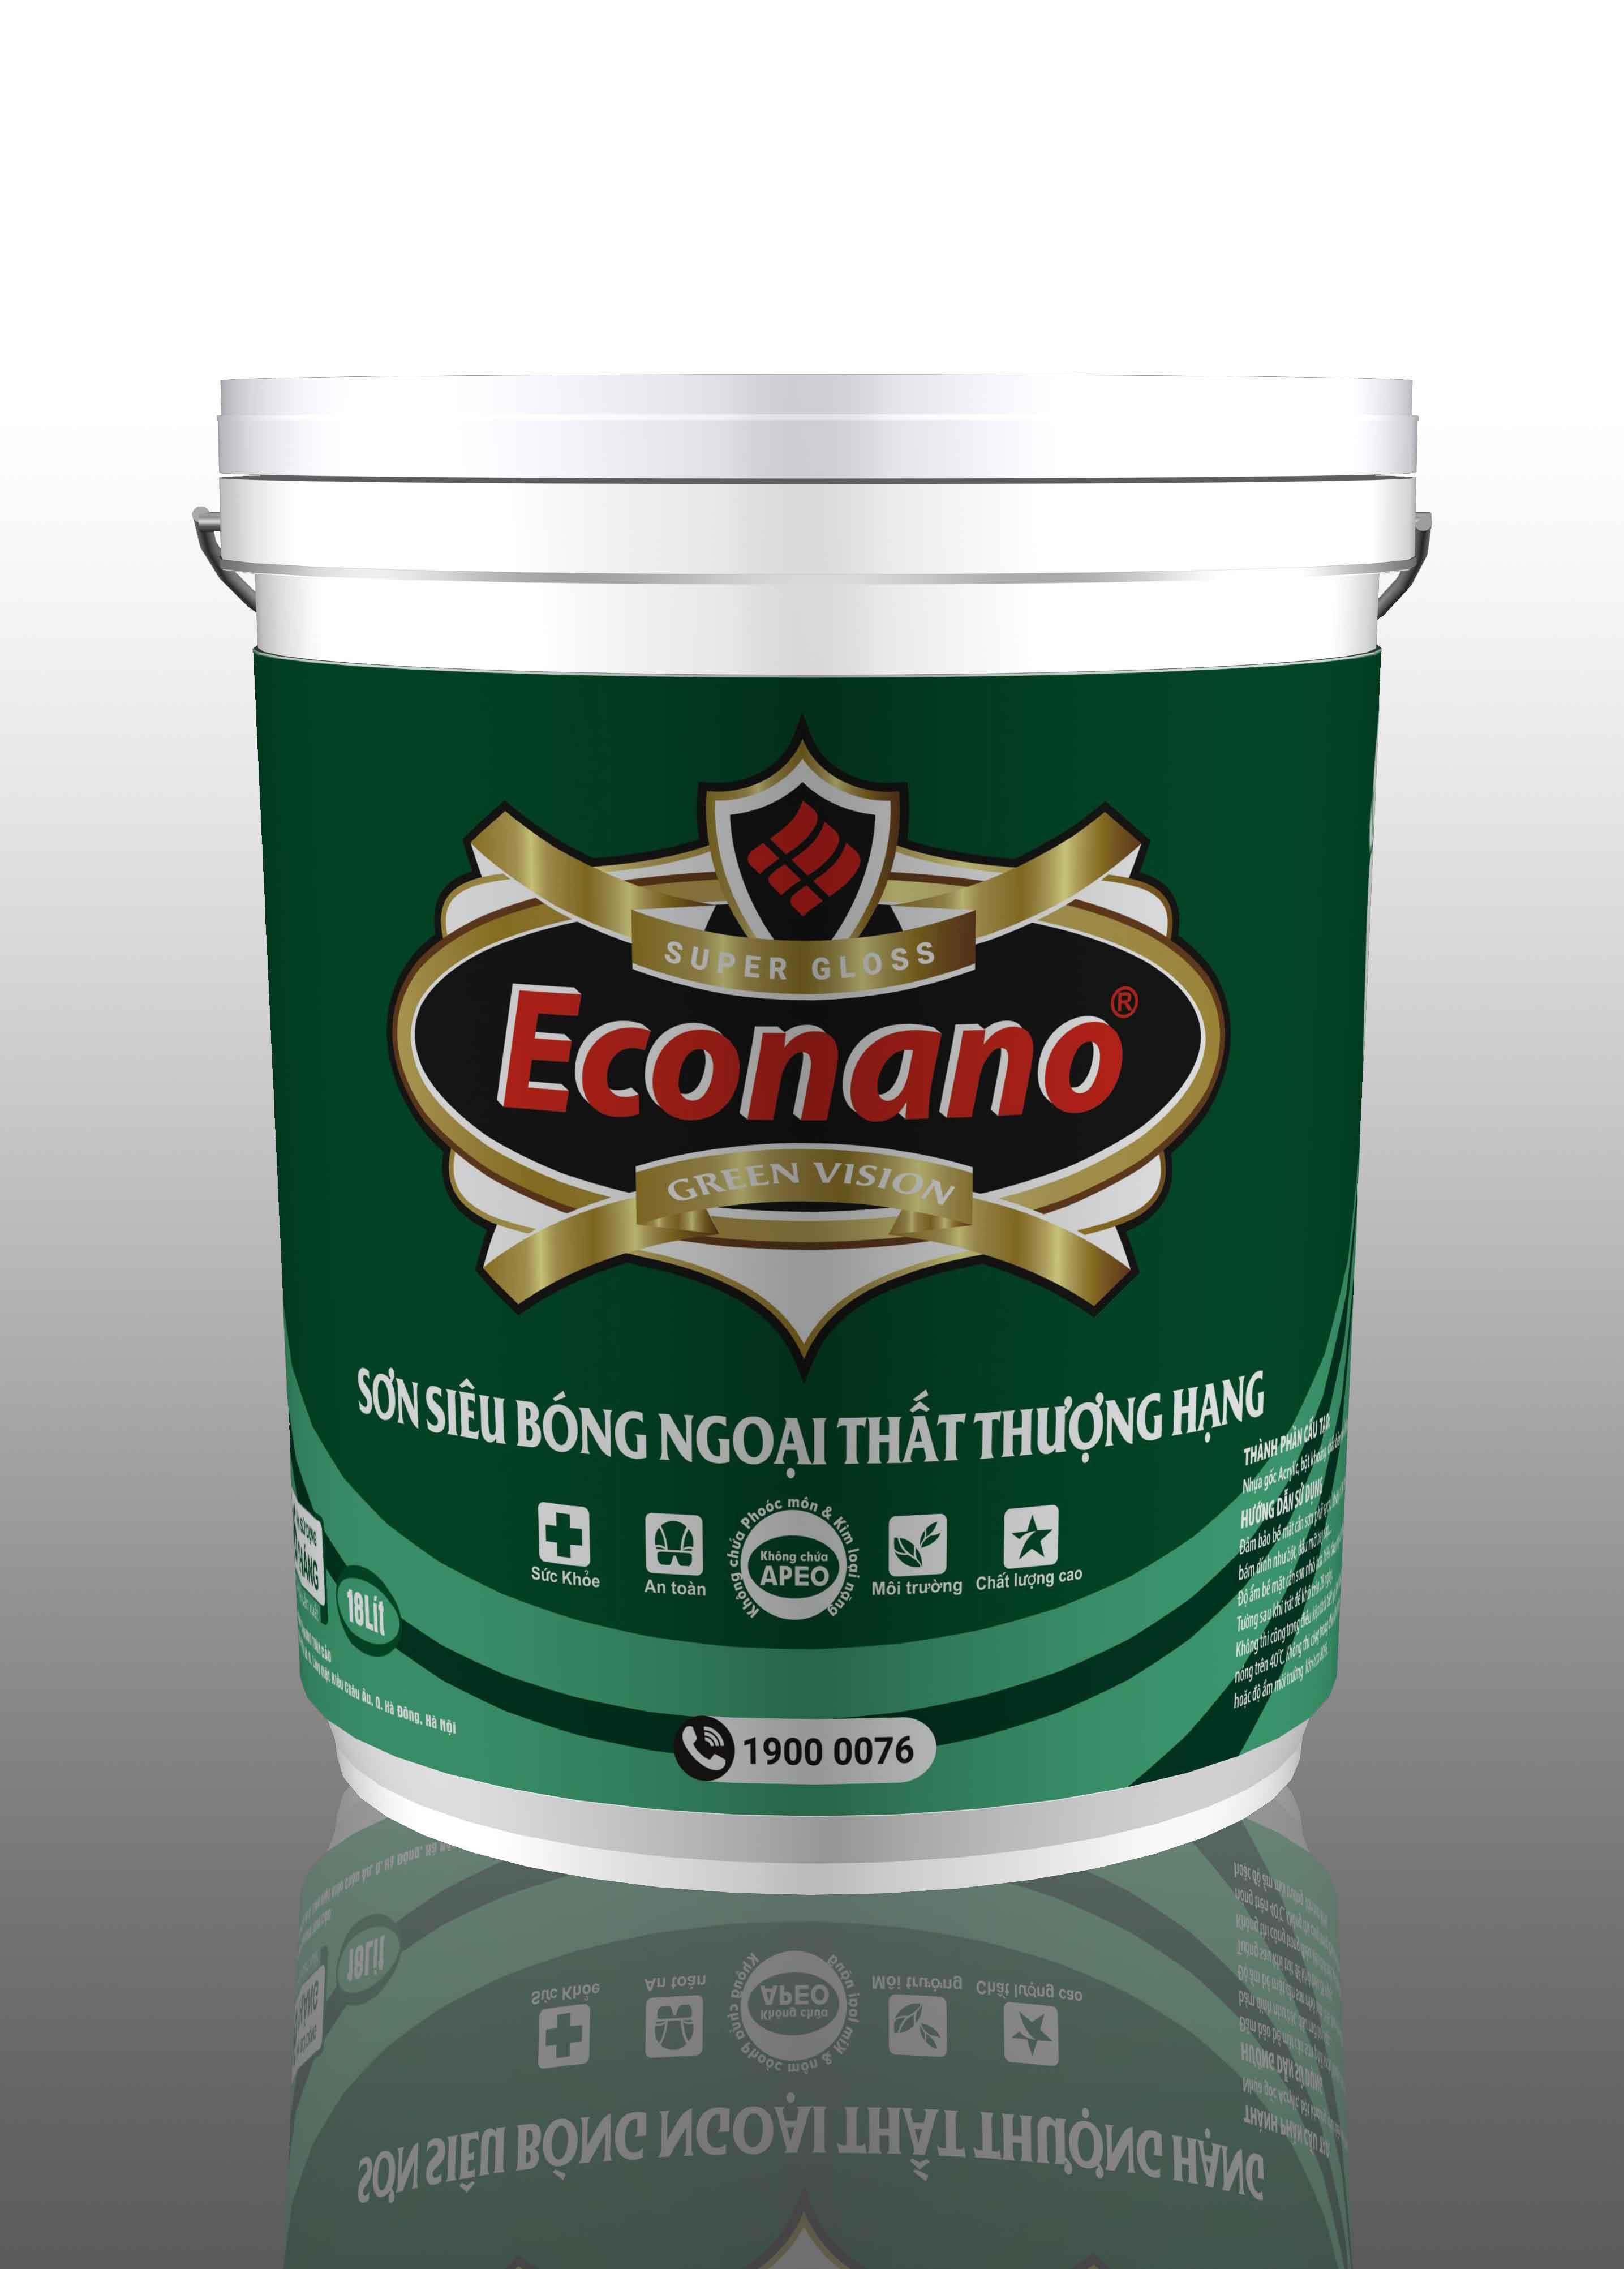 son-sieu-bong-ngoai-that-thuong-hang-econano